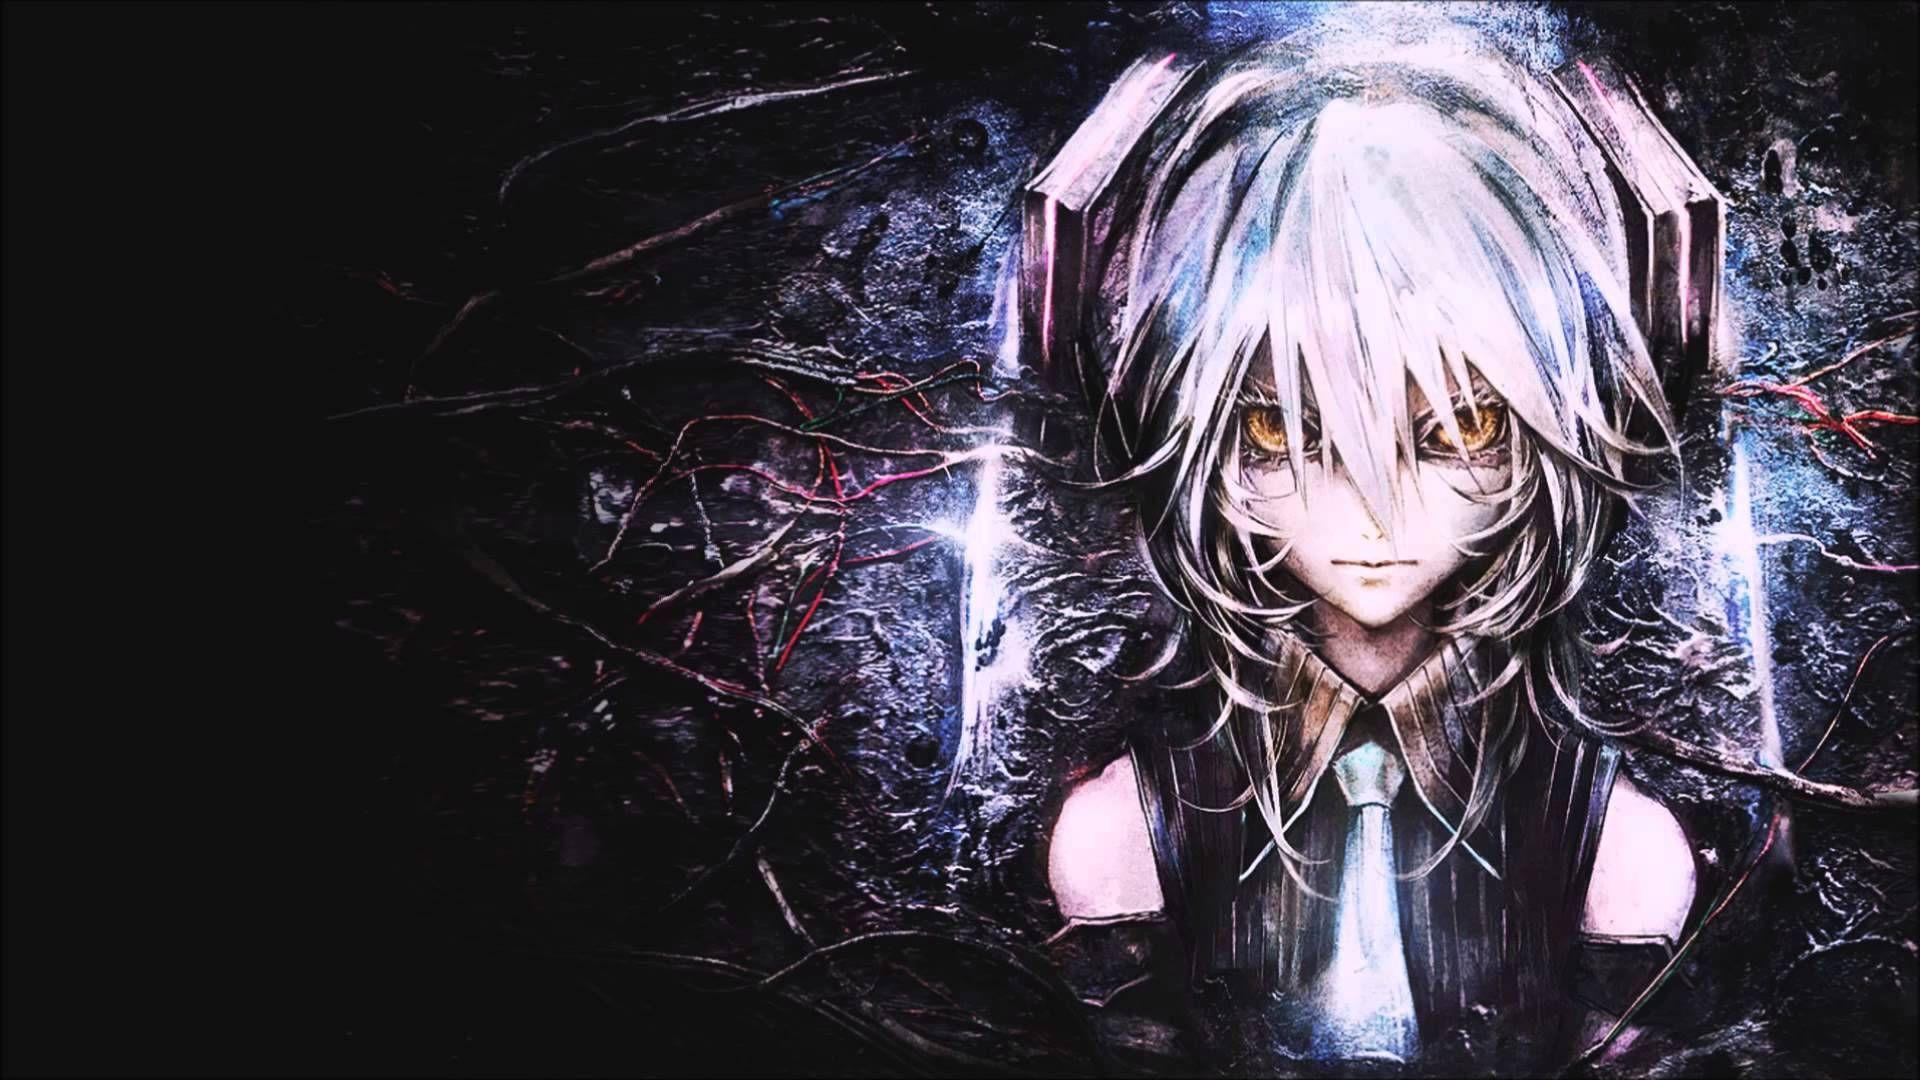 Arsonist S Lullaby Nightcore Hd Anime Wallpapers Cool Anime Wallpapers Anime Wallpaper